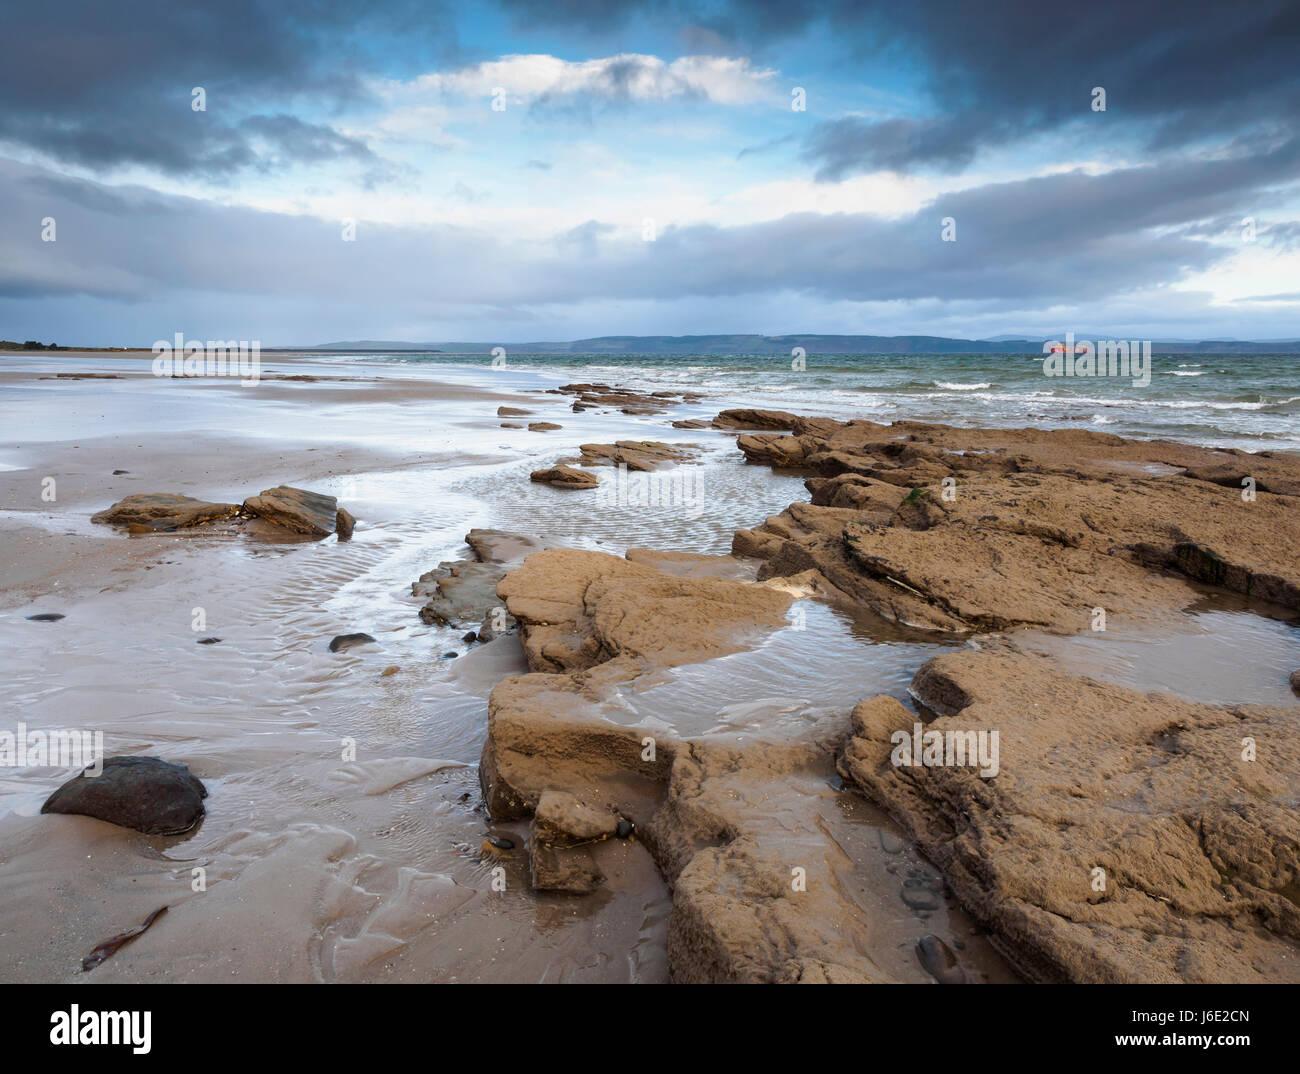 Nairn Beach, Moray - Stock Image